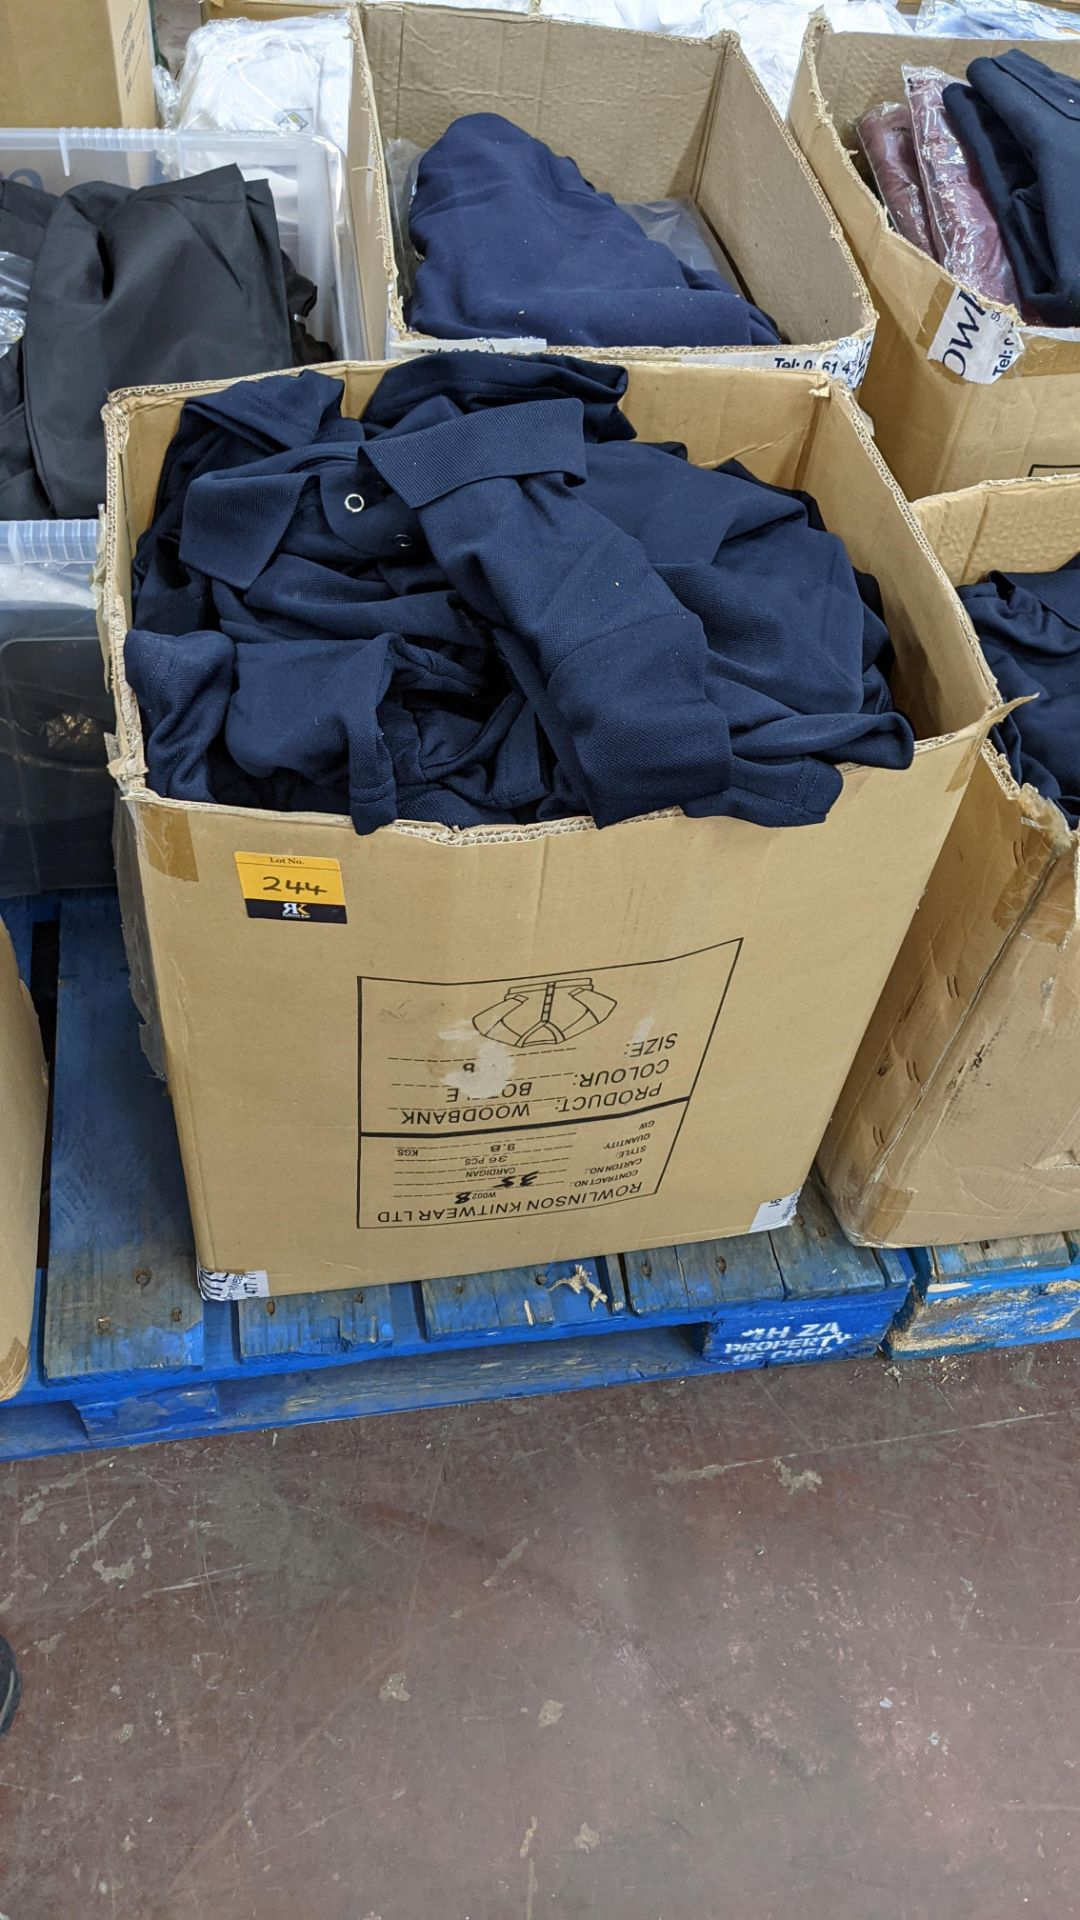 Large quantity of blue polo shirts - 1 box - Image 2 of 4